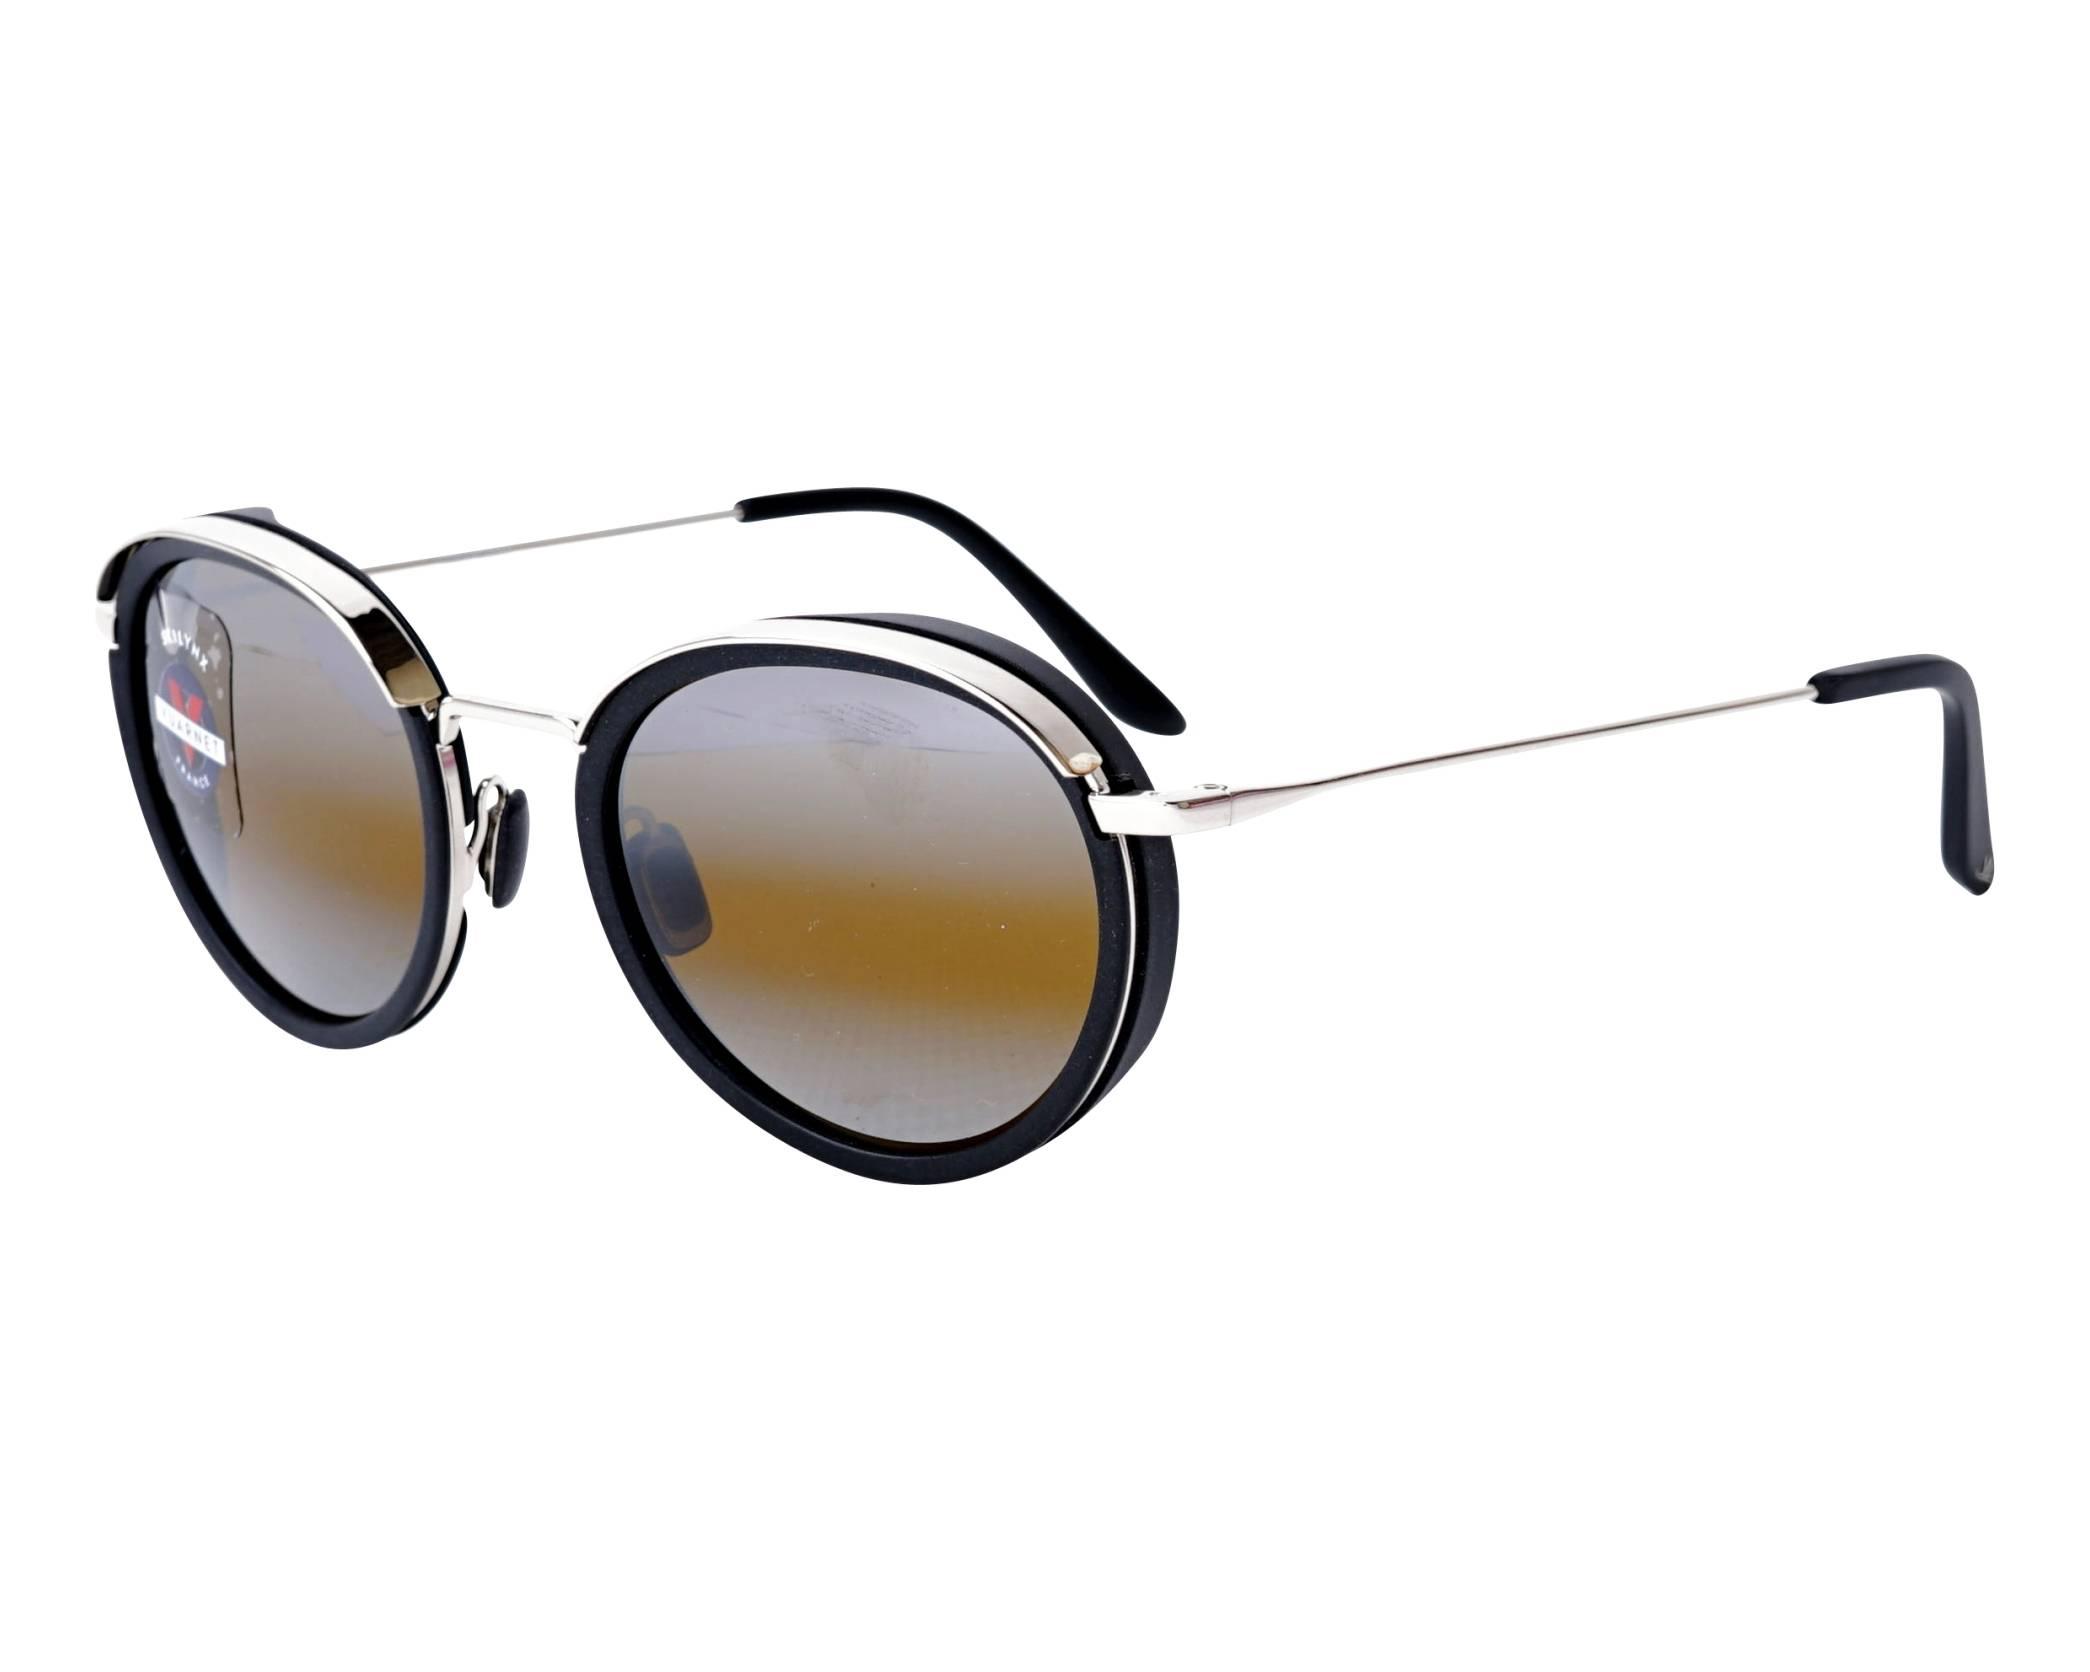 b23240a4cb Sunglasses Vuarnet VL-1818 0002-7184 47-17 Black Silver profile view